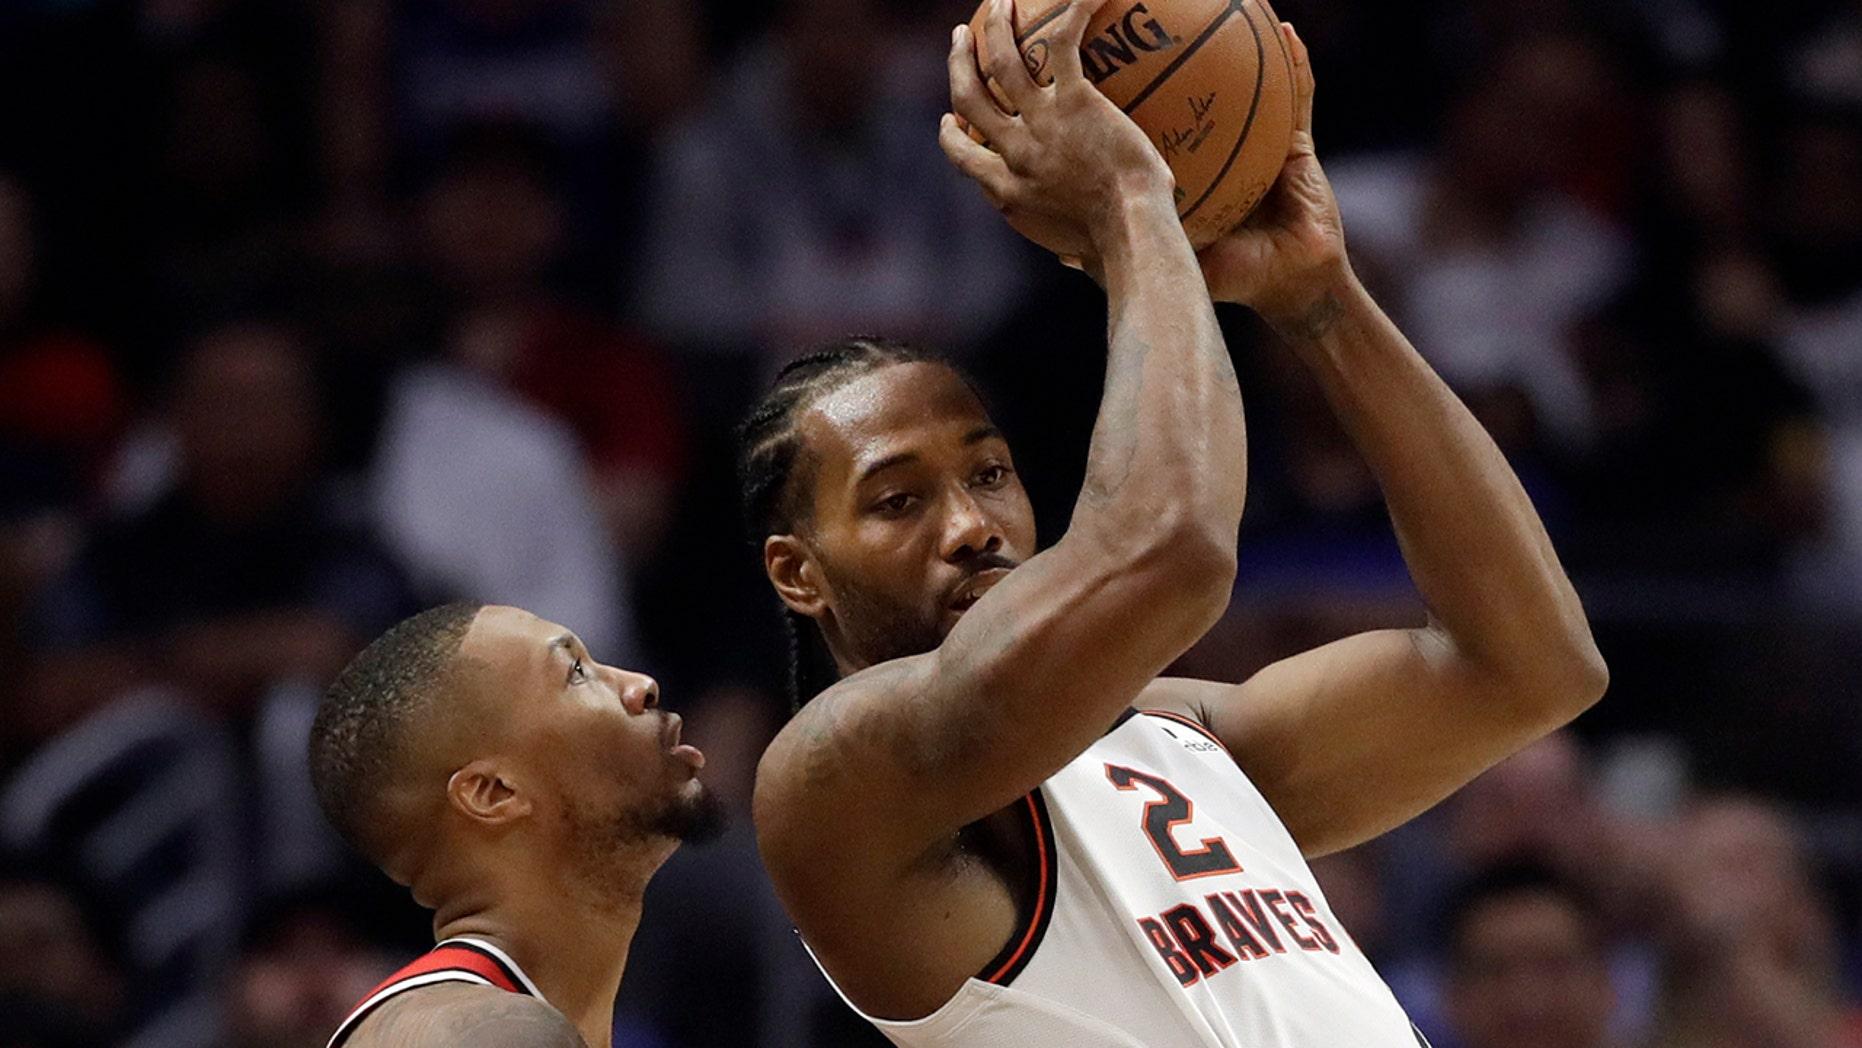 Los Angeles Clippers' Kawhi Leonard (2) is shielded by Portland Trail Blazers' Damian Lillard during a initial half of an NBA basketball diversion Thursday, Nov. 7, 2019, in Los Angeles. (AP Photo/Marcio Jose Sanchez)